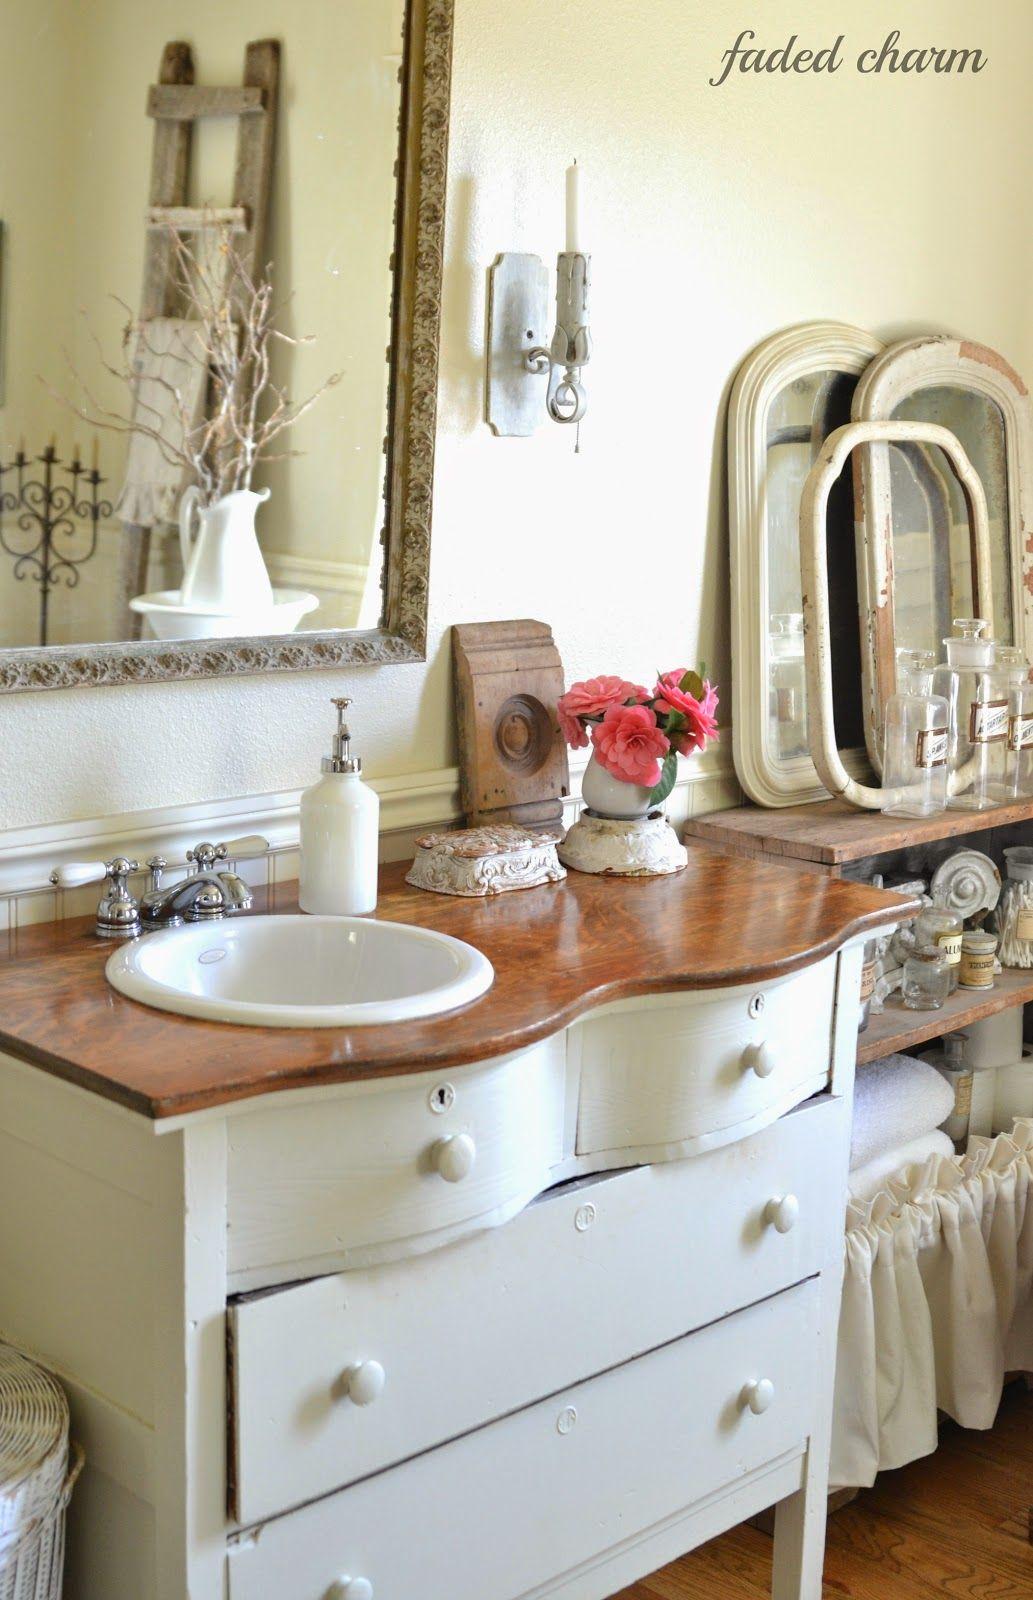 Fresh Flowers Shabby chic bathroom, My home design